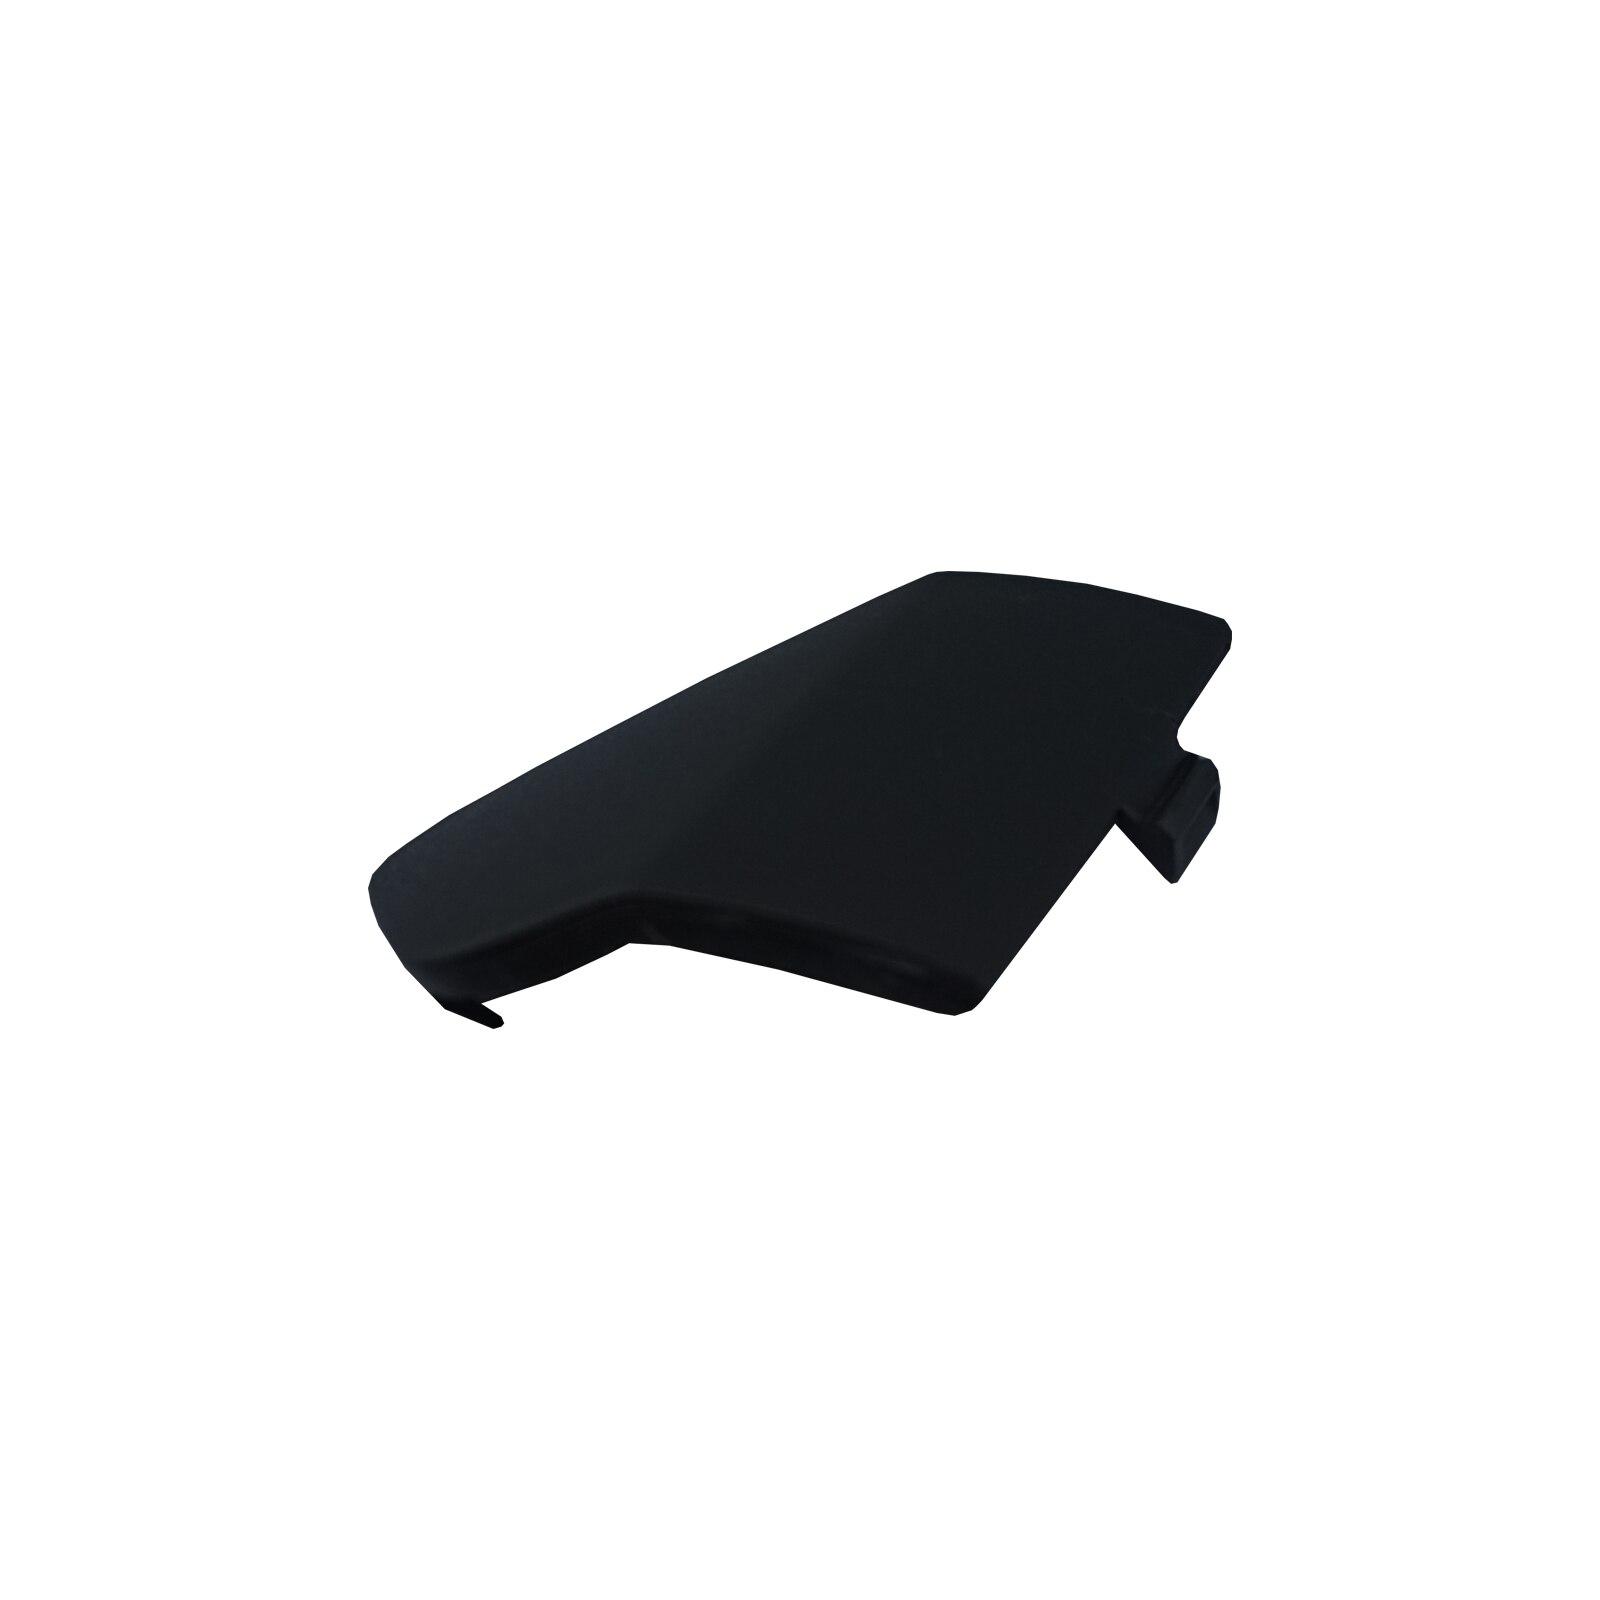 BSP732 parachoques delantero barra de remolque ojo cubierta 8A6117A989AB para Fiesta 08-12